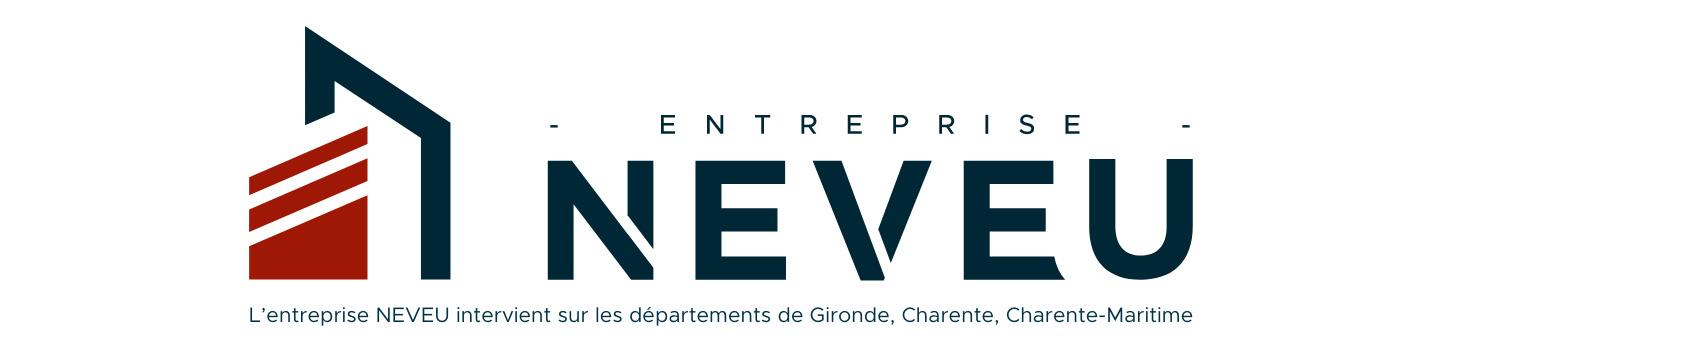 logo-neveu-entreprise-contruction